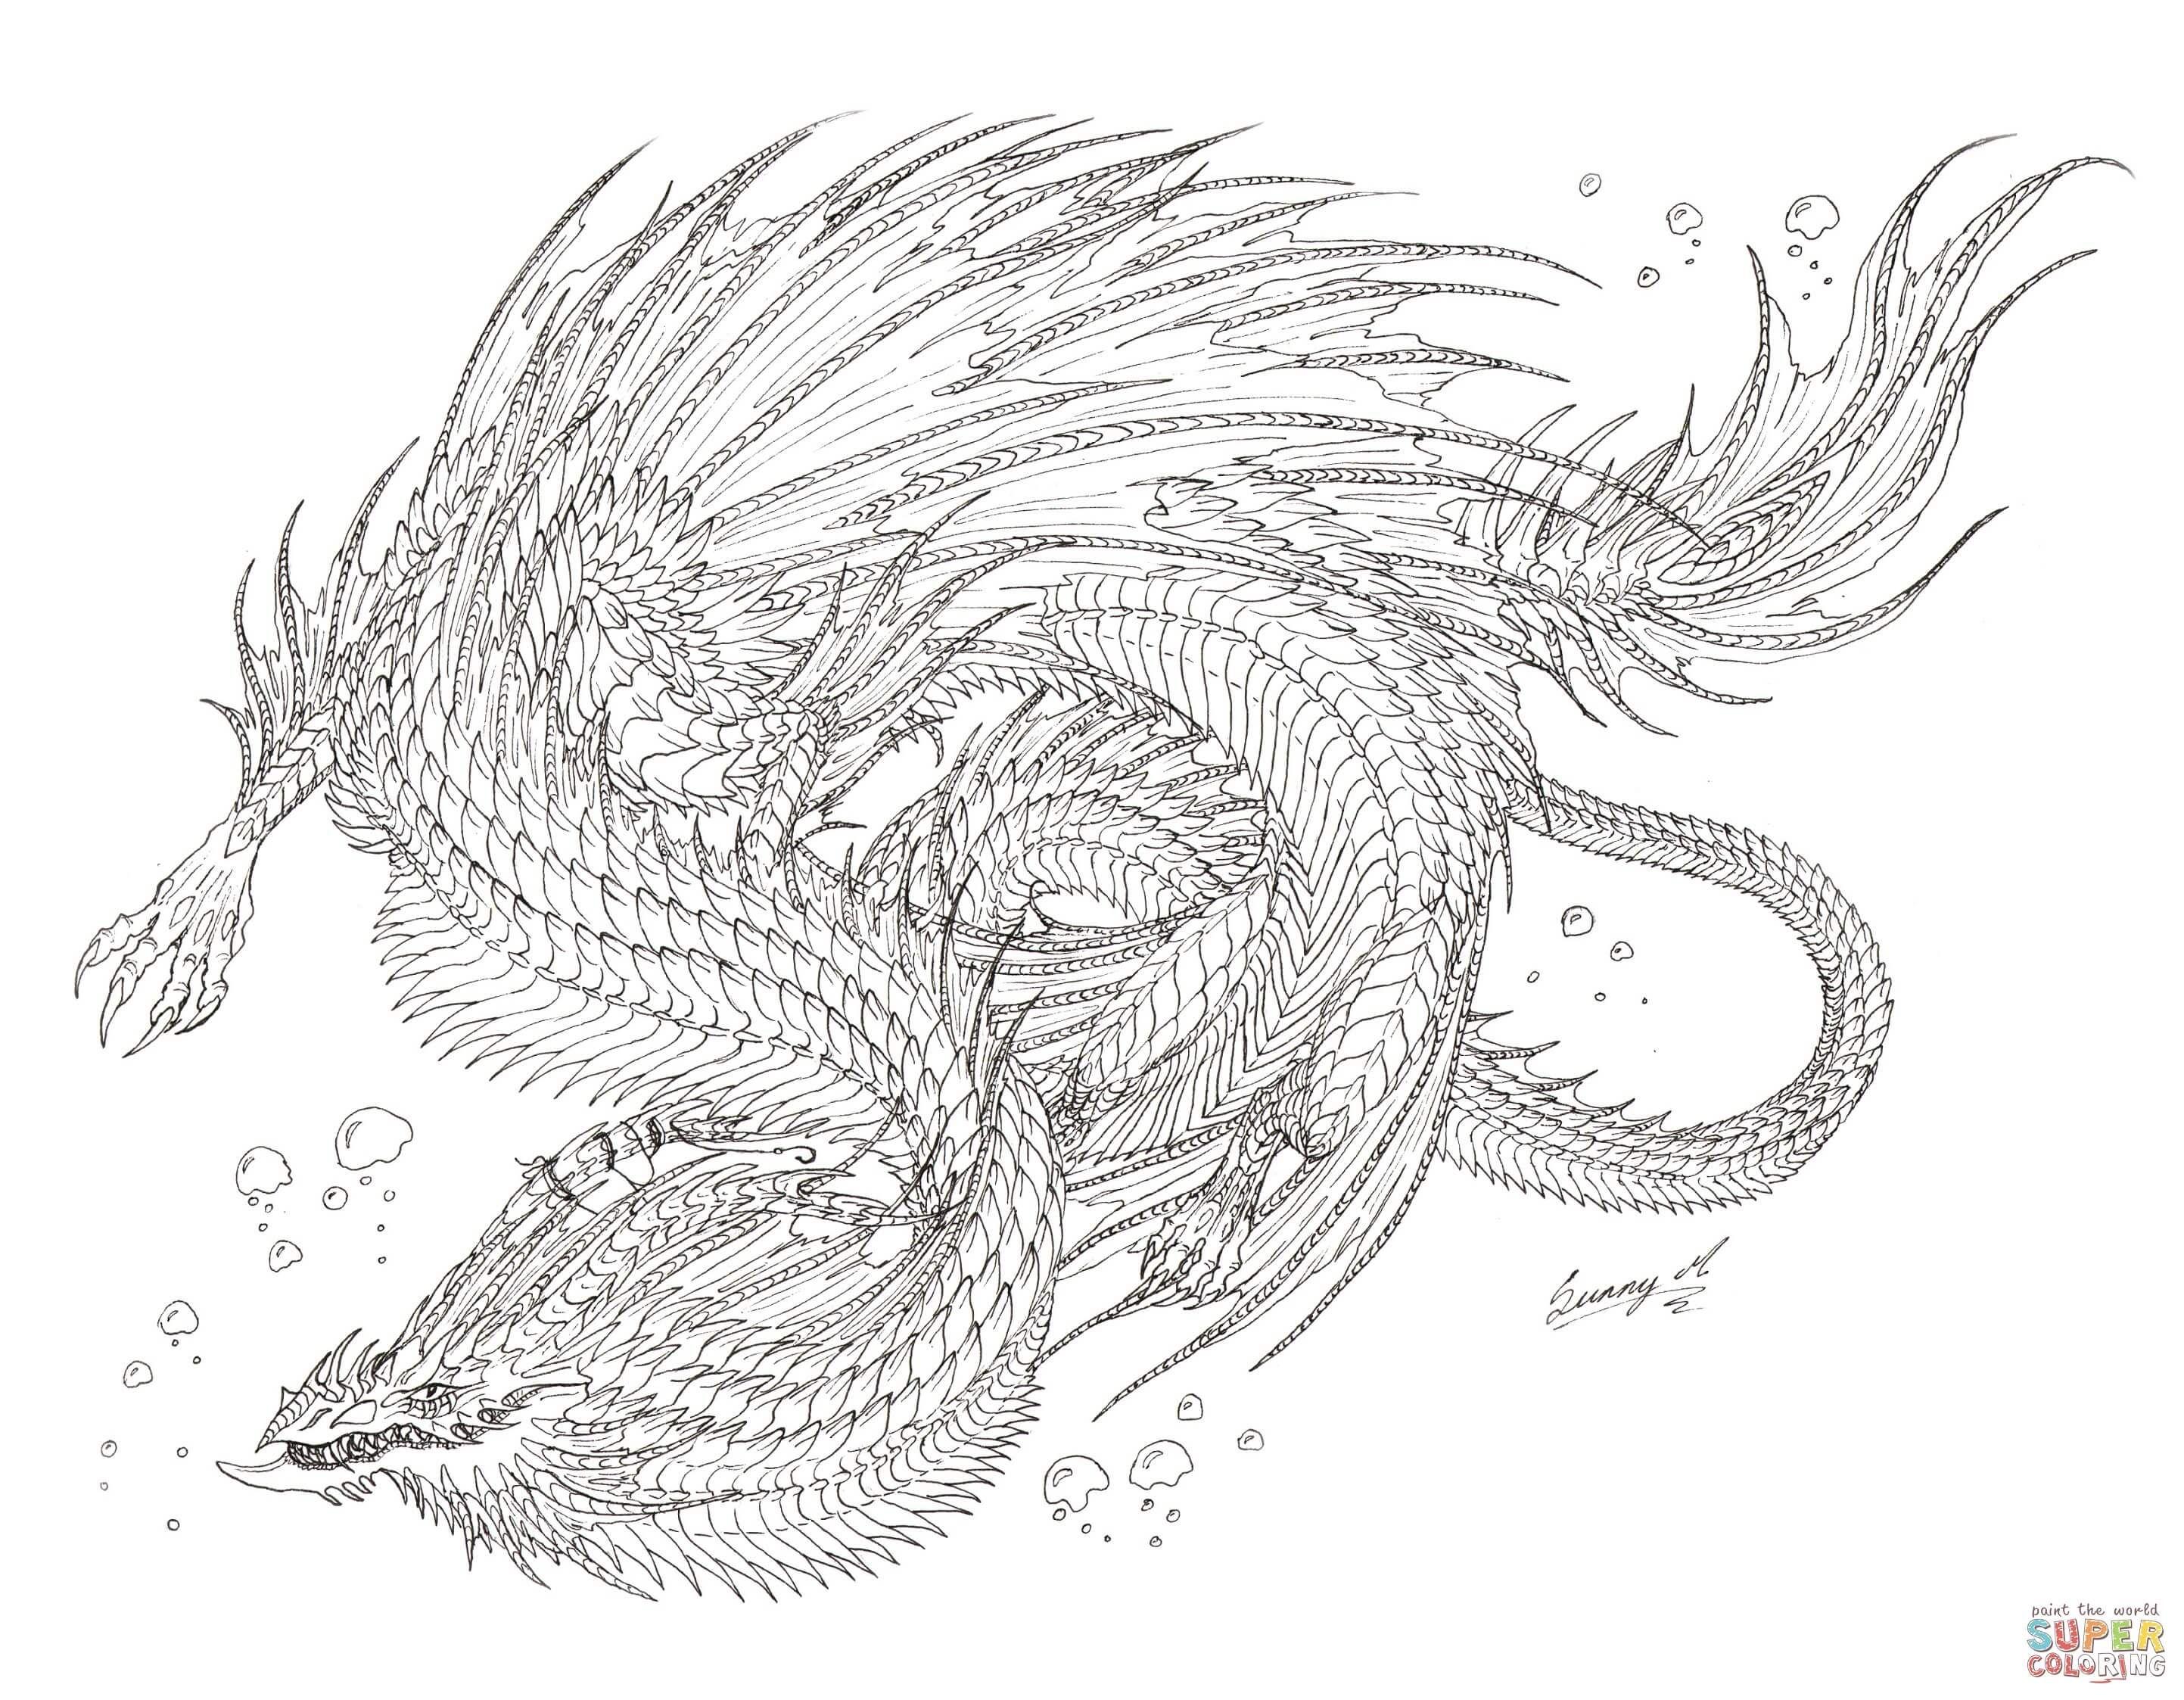 Sea Serpent Dragon Coloring Page Free Printable Coloring Pages Monster Coloring Pages Dragon Coloring Page Snake Coloring Pages